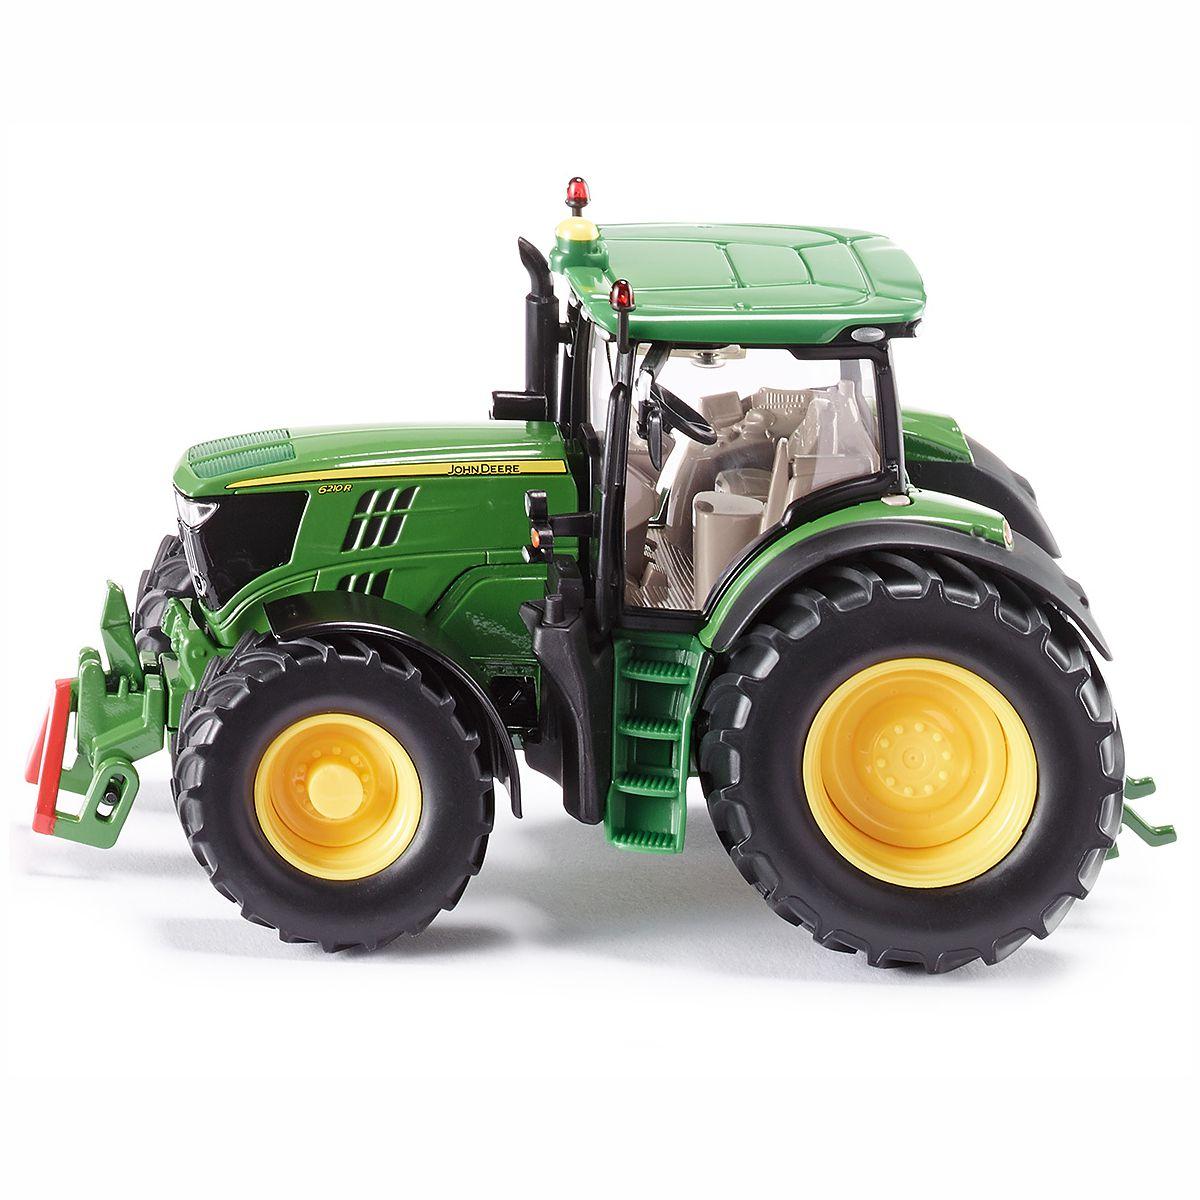 8de899eafd9 Siku 3282 John Deere 6210R Traktor 1:32 NEU in OVP